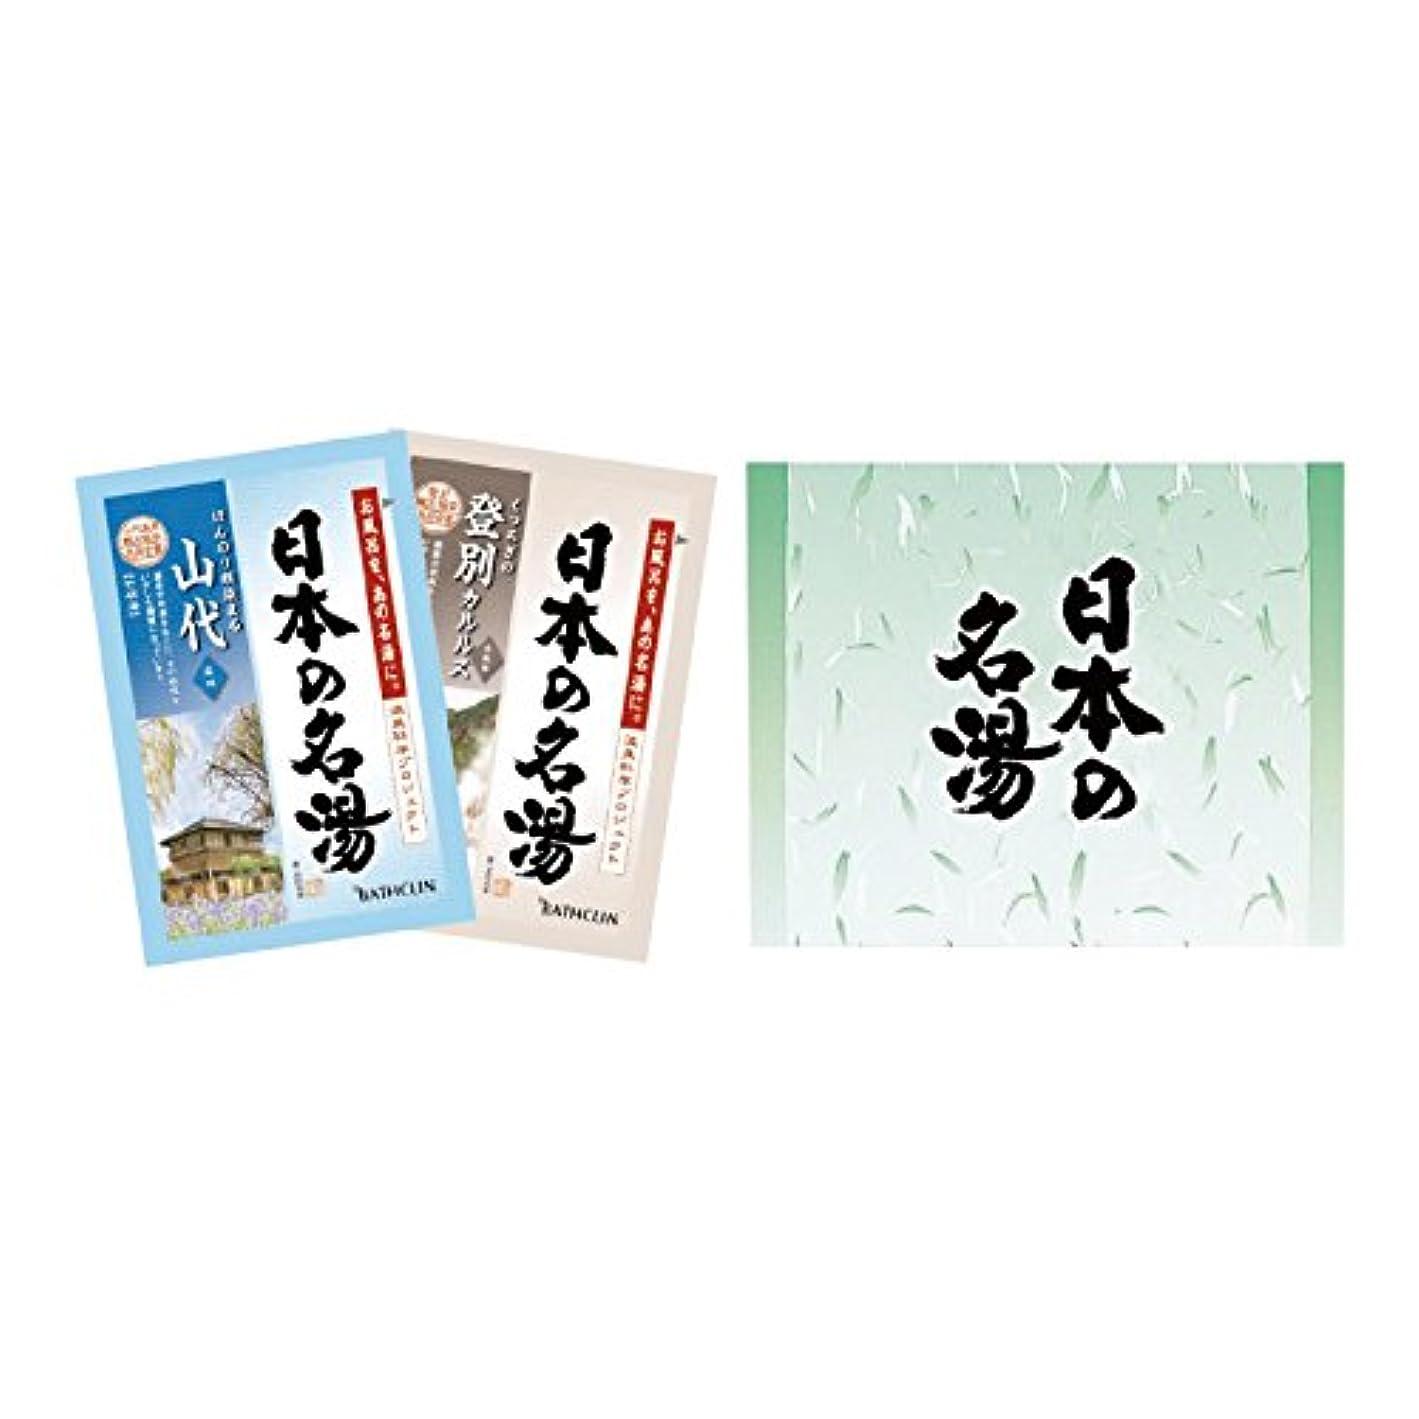 爆発退屈ヘア日本の名湯 入浴剤 2包入